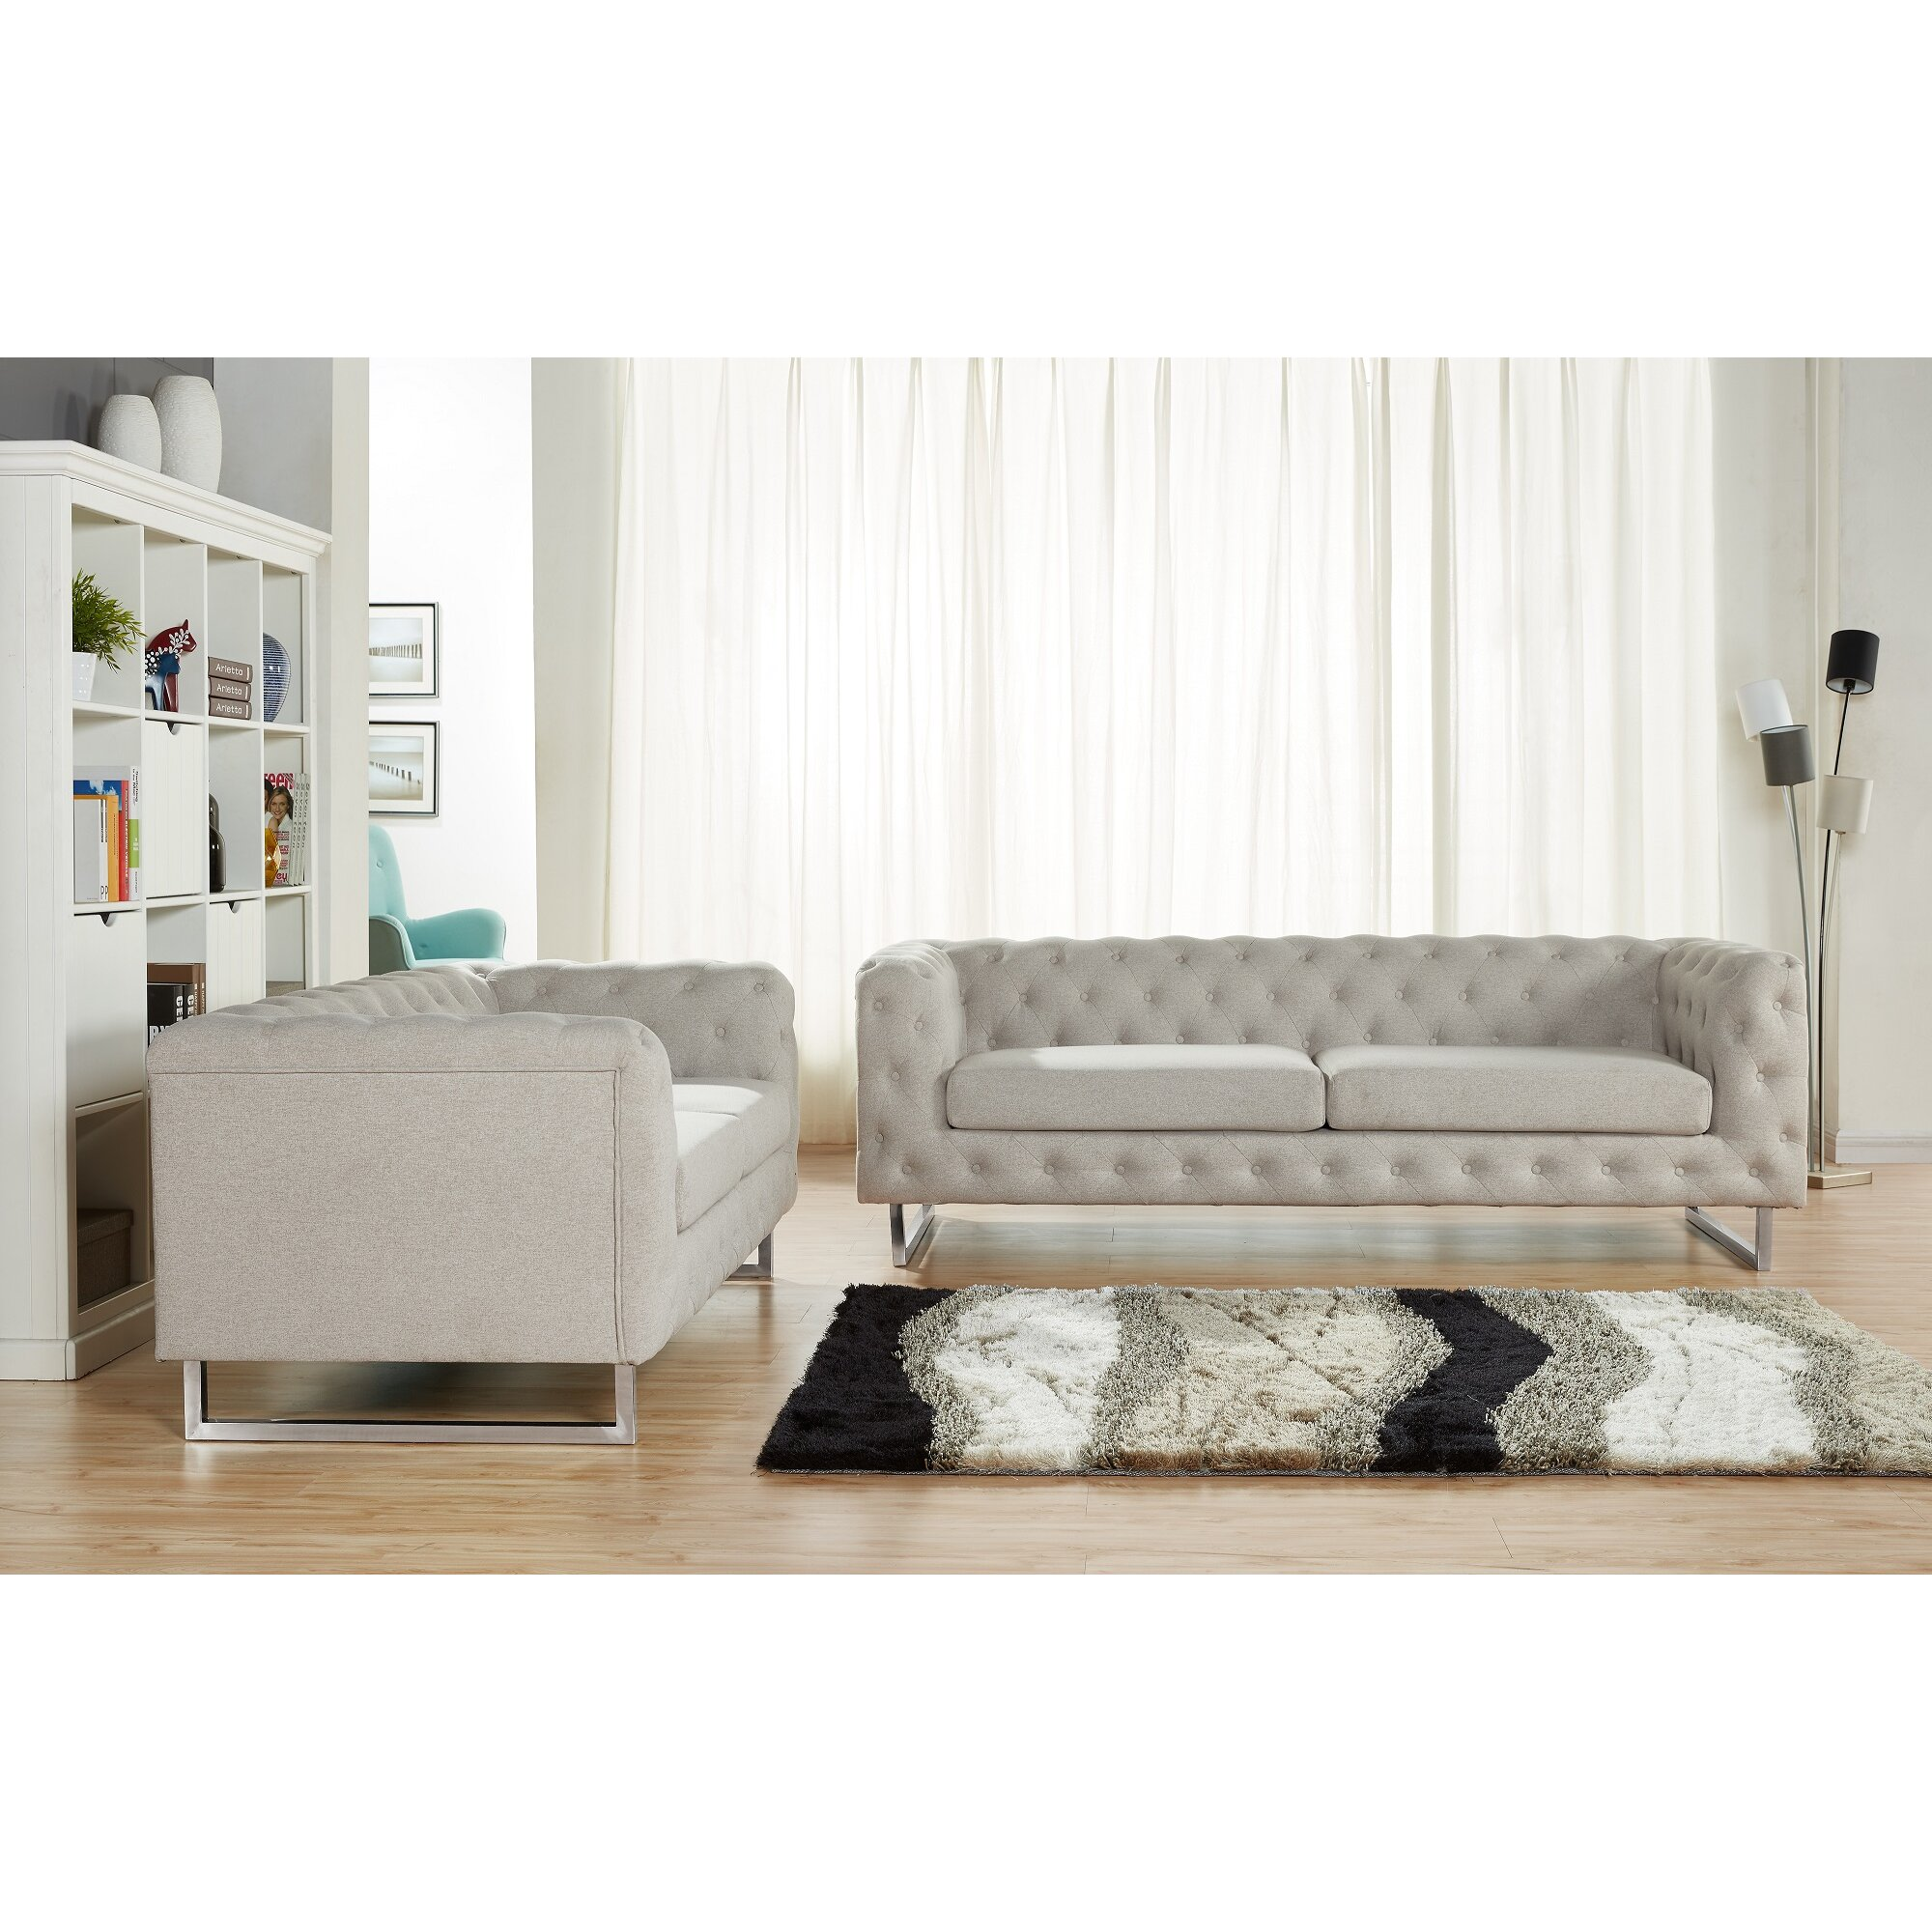 Container Scroll 2 Piece Modern Linen Fabric Sofa Set